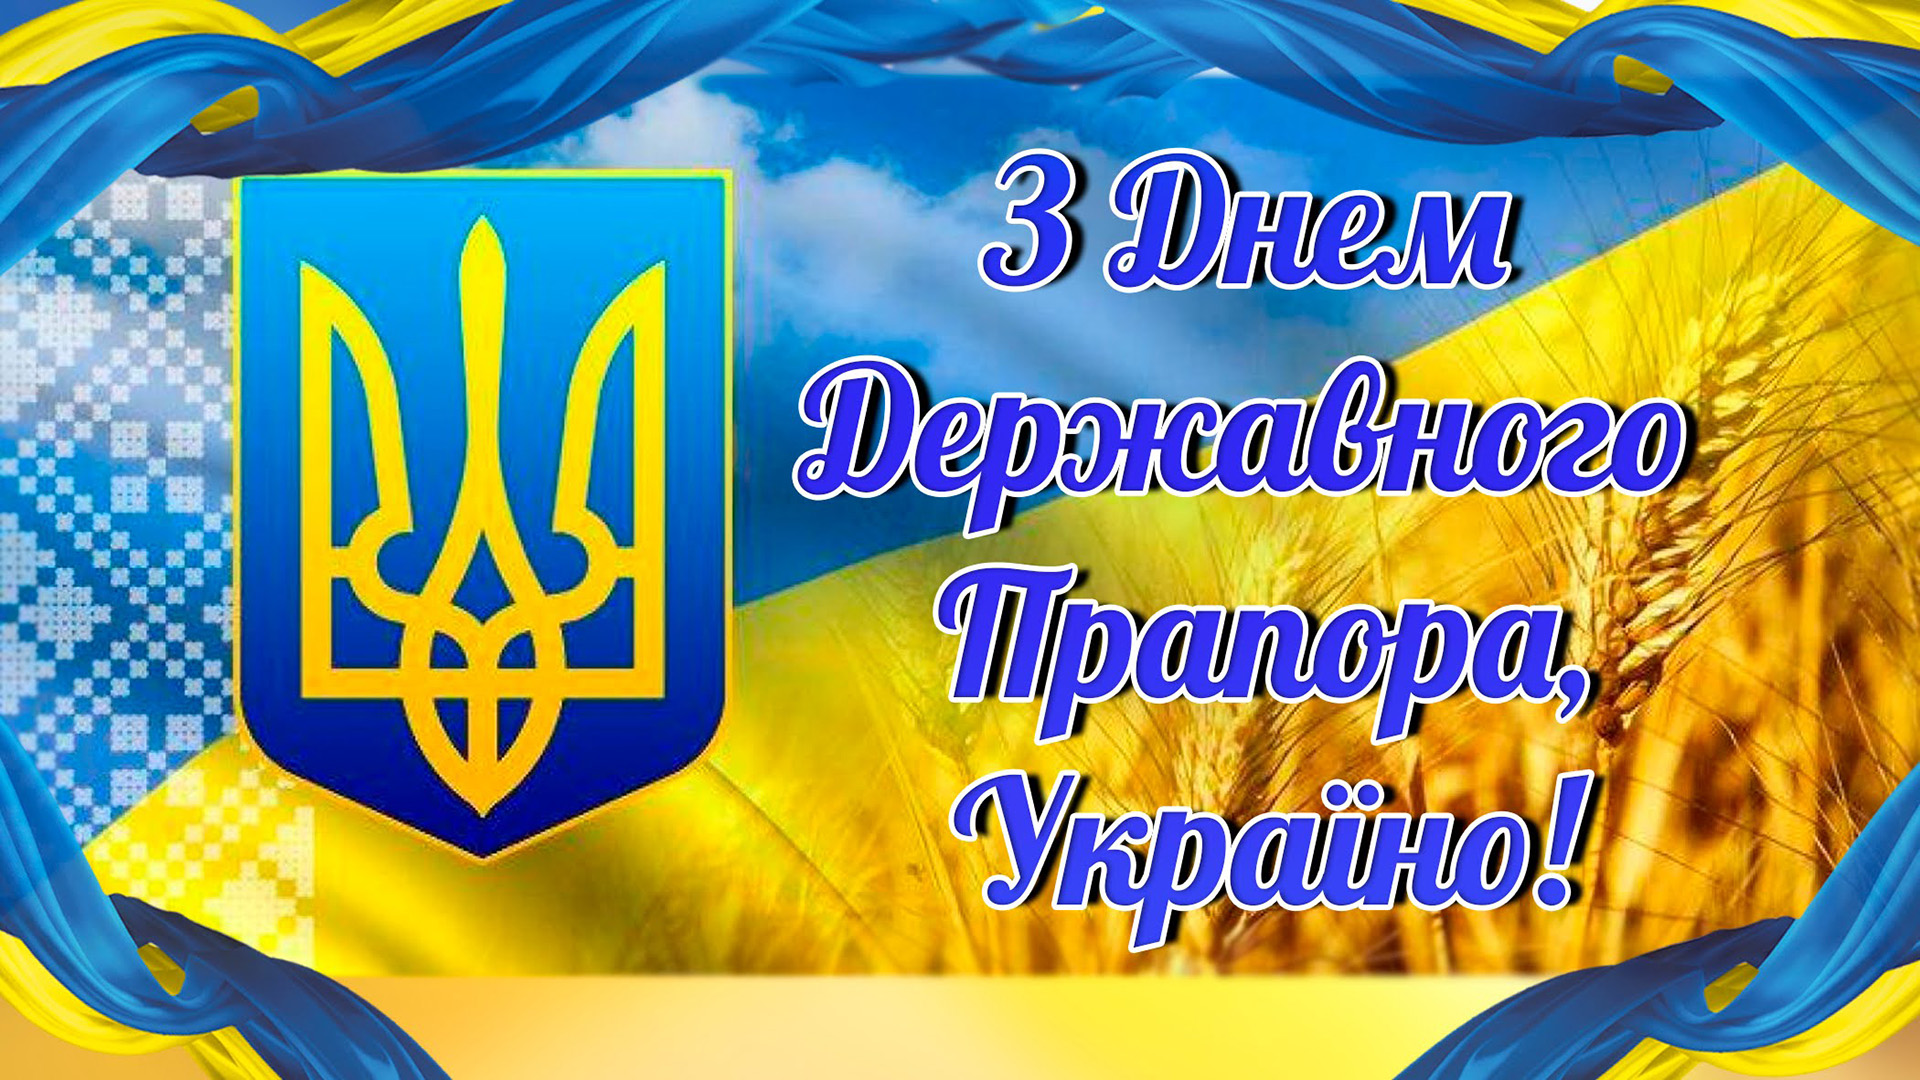 HDoboi.Kiev.ua - З днем прапора України картинки, full hd